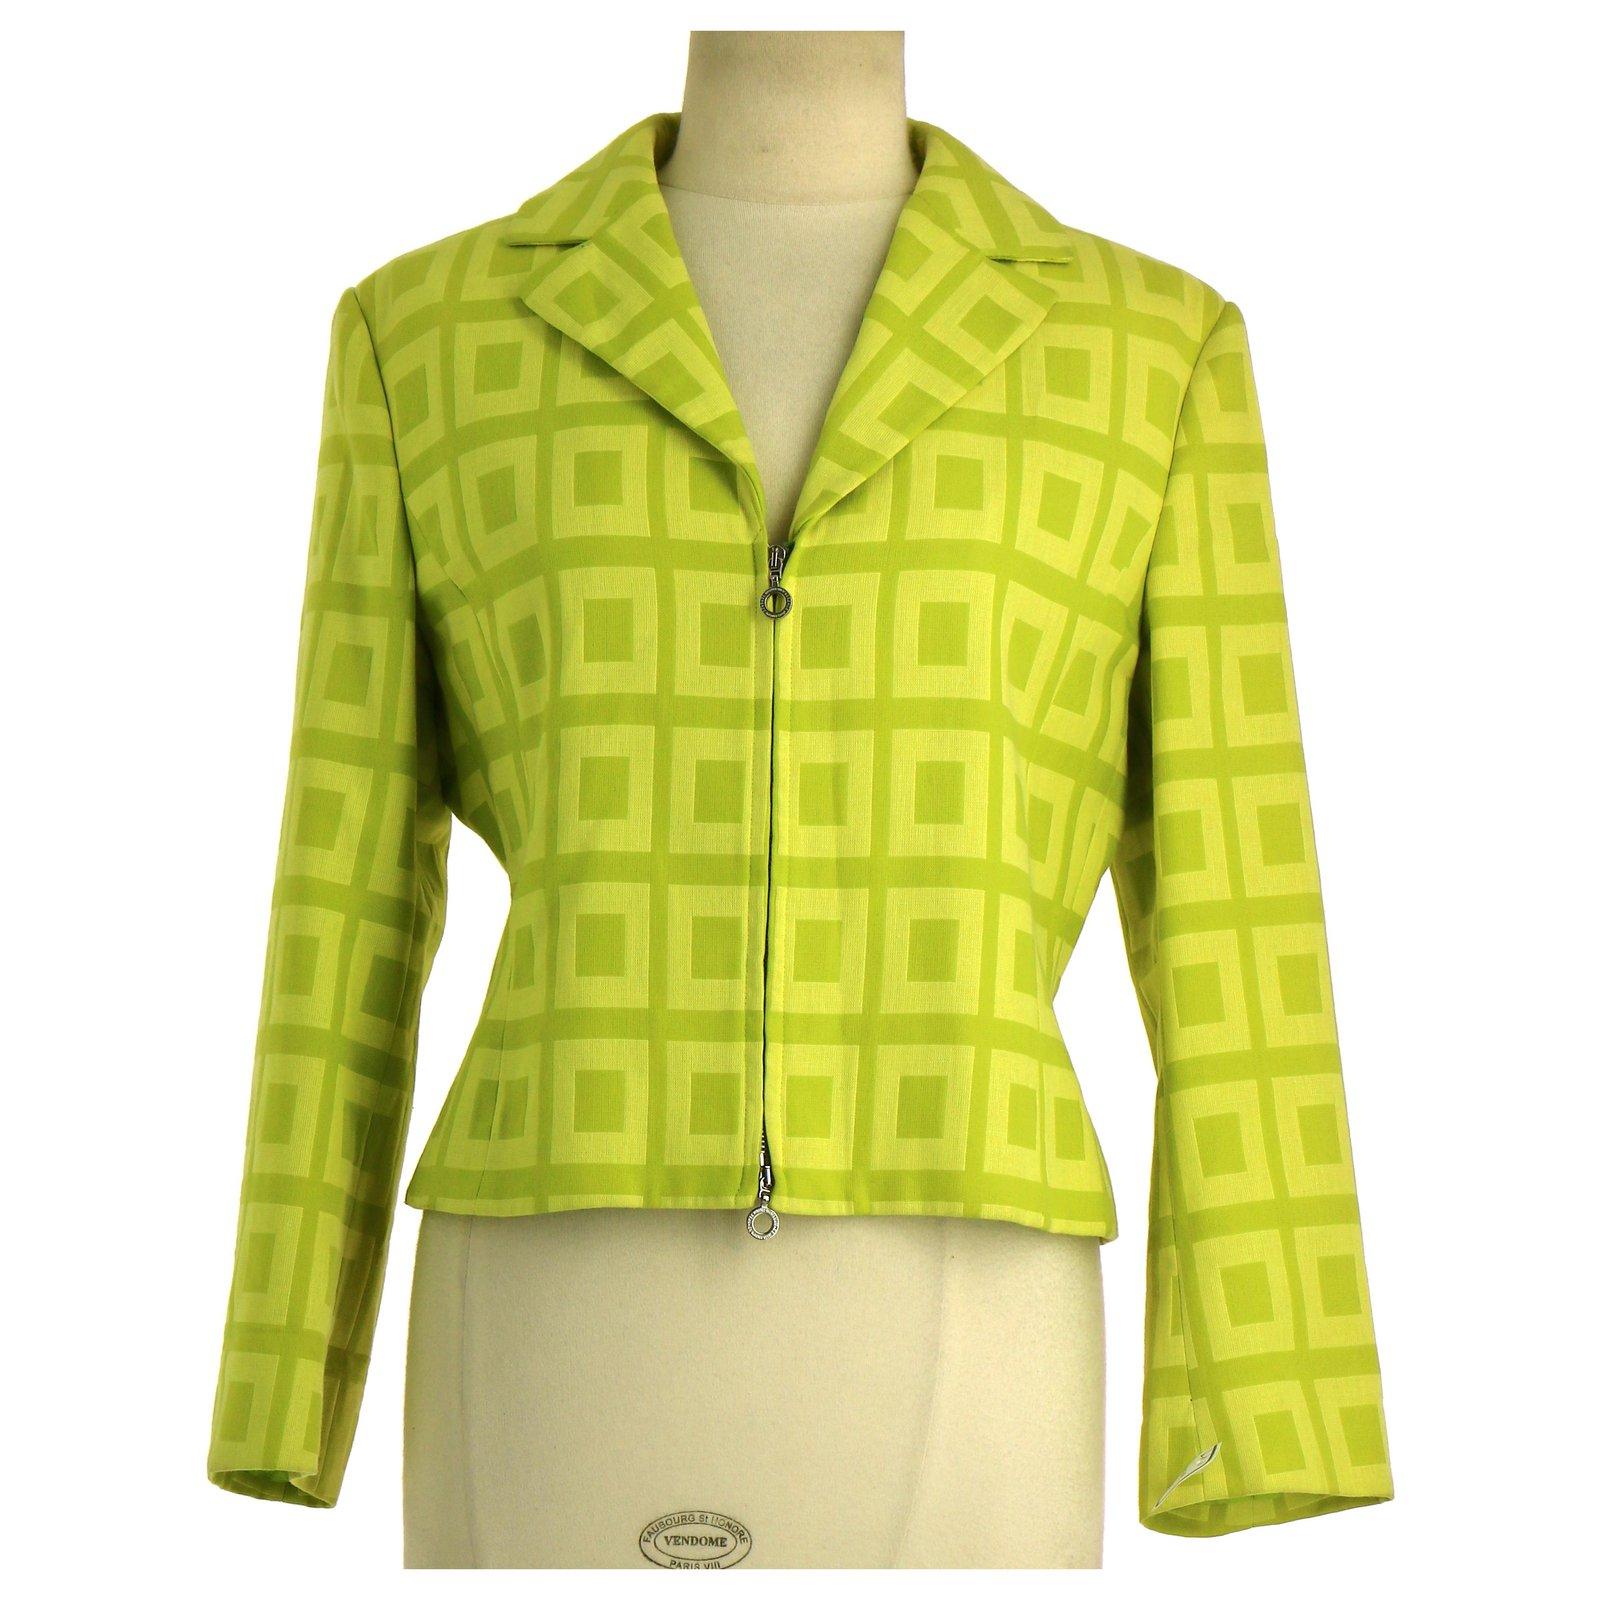 Vestes Versace Veste / Blazer Coton Vert